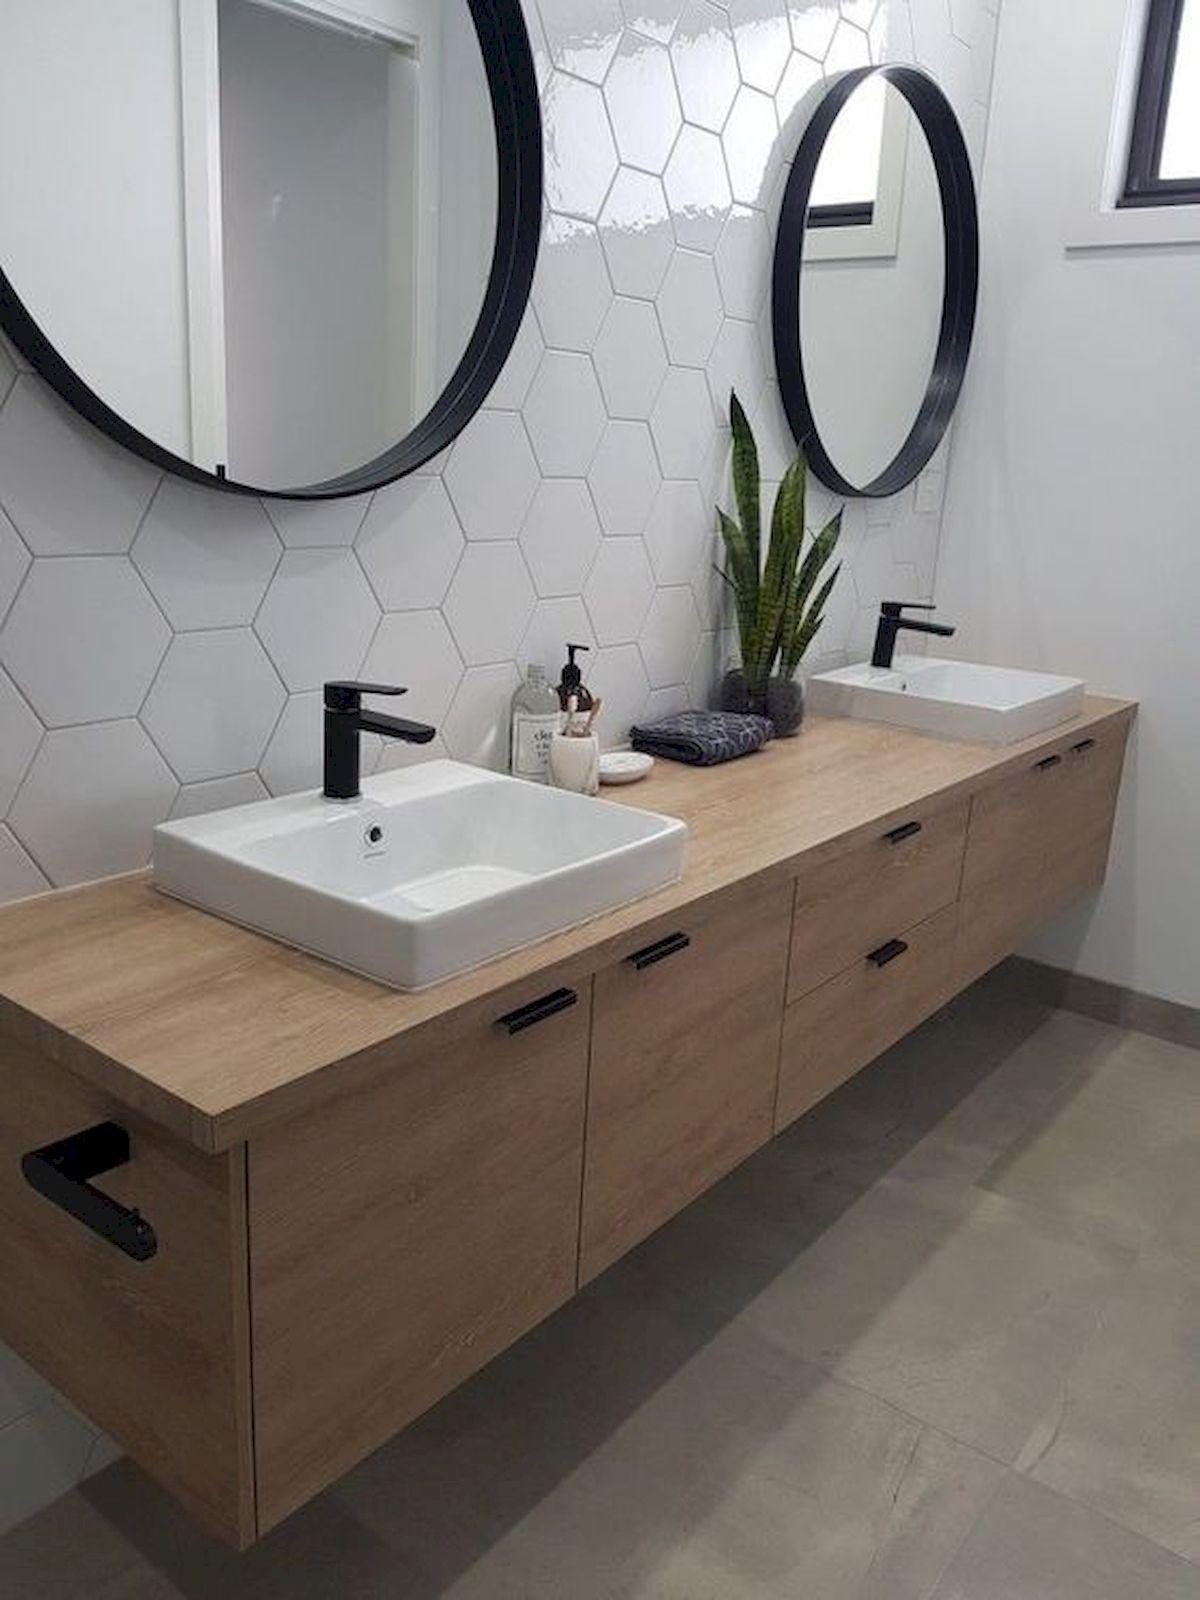 Cool bathroom mirror ideas 41